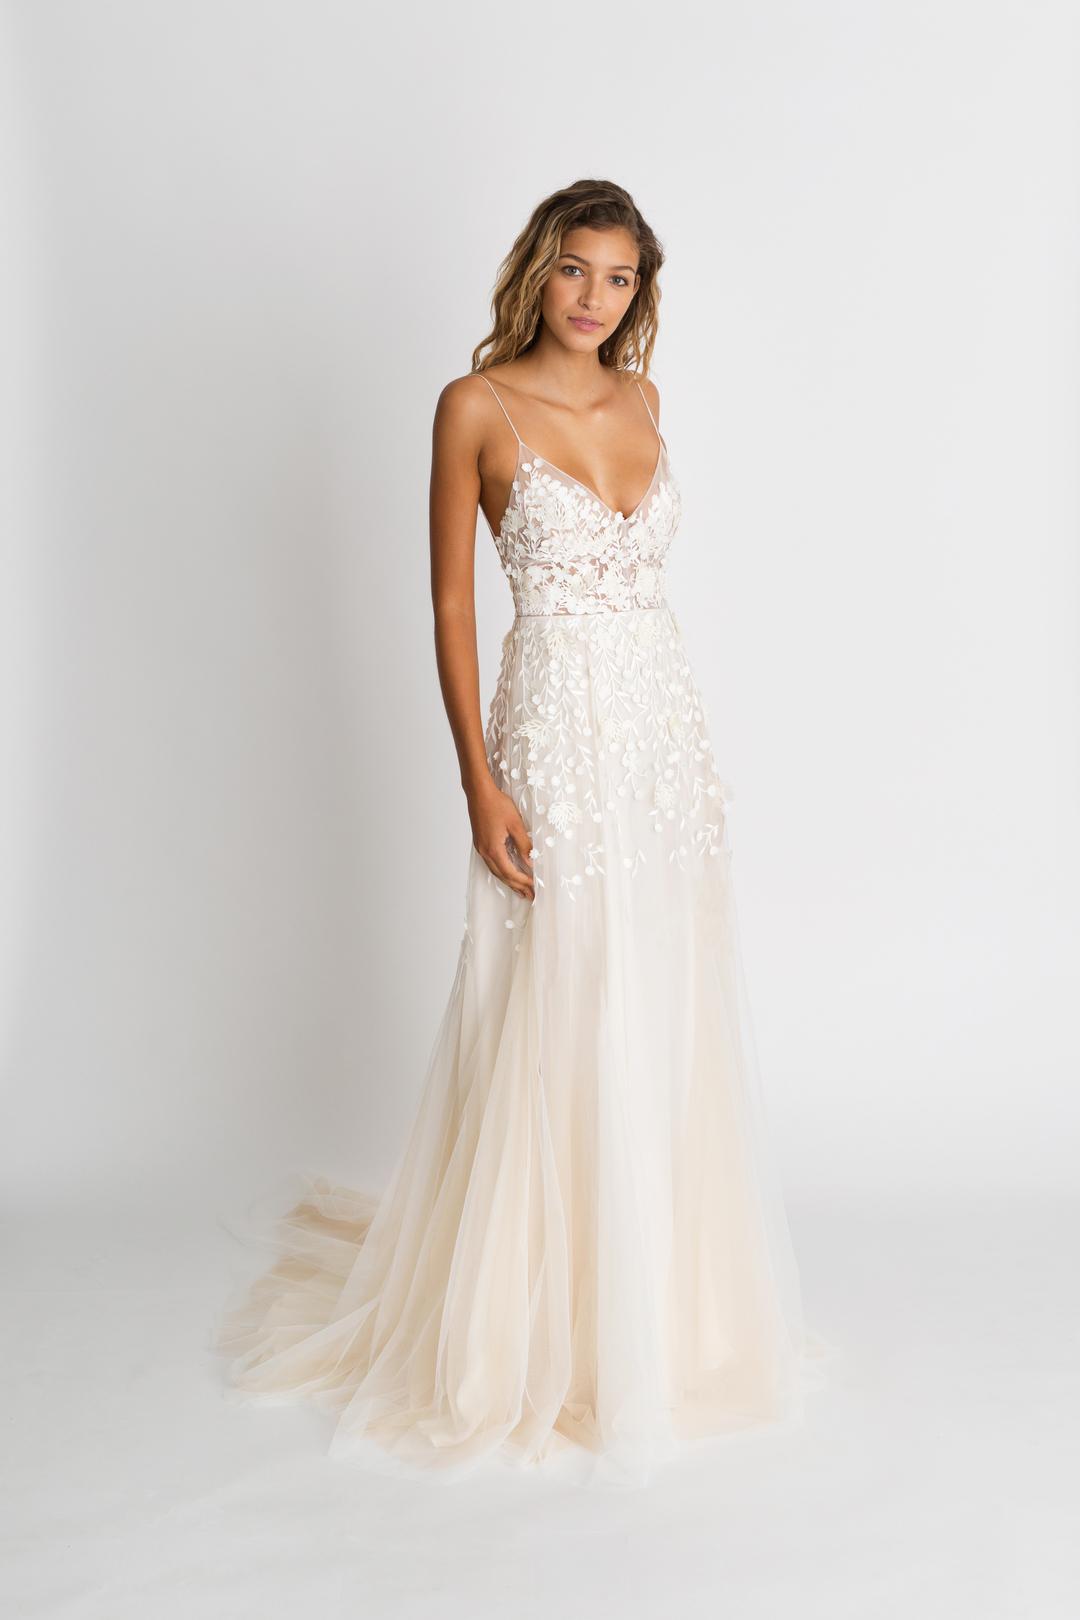 Dress main 2x 1543694809